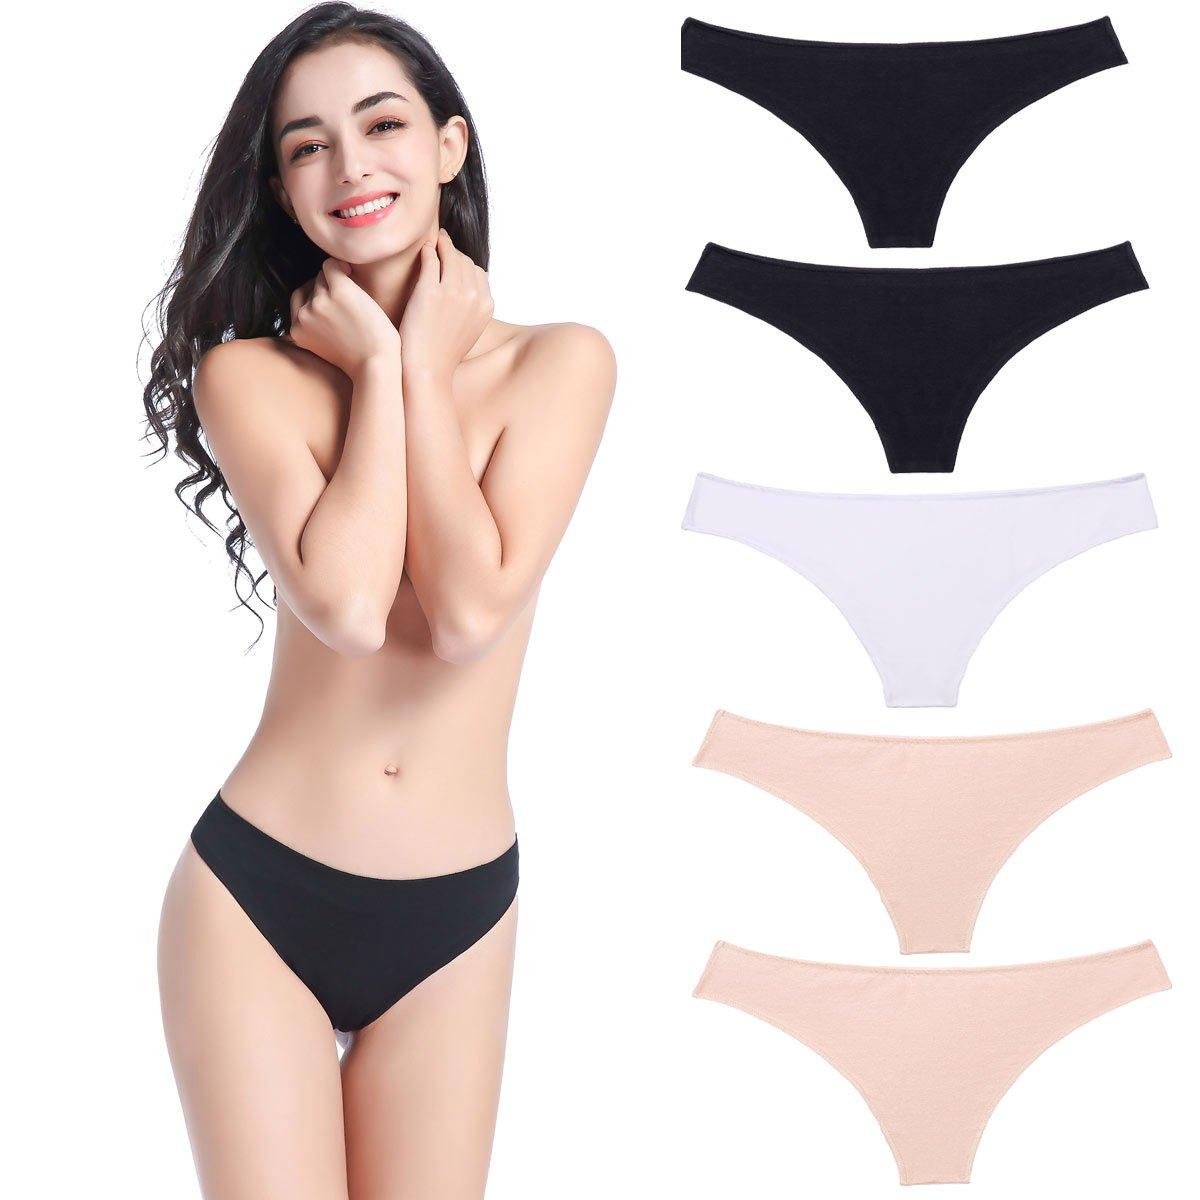 6bf75fff0 wirarpa Women's Cotton Stretch Thong Panties 5 Pack Sexy Bikini Underwear  Low Rise Underpants at Amazon Women's Clothing store: